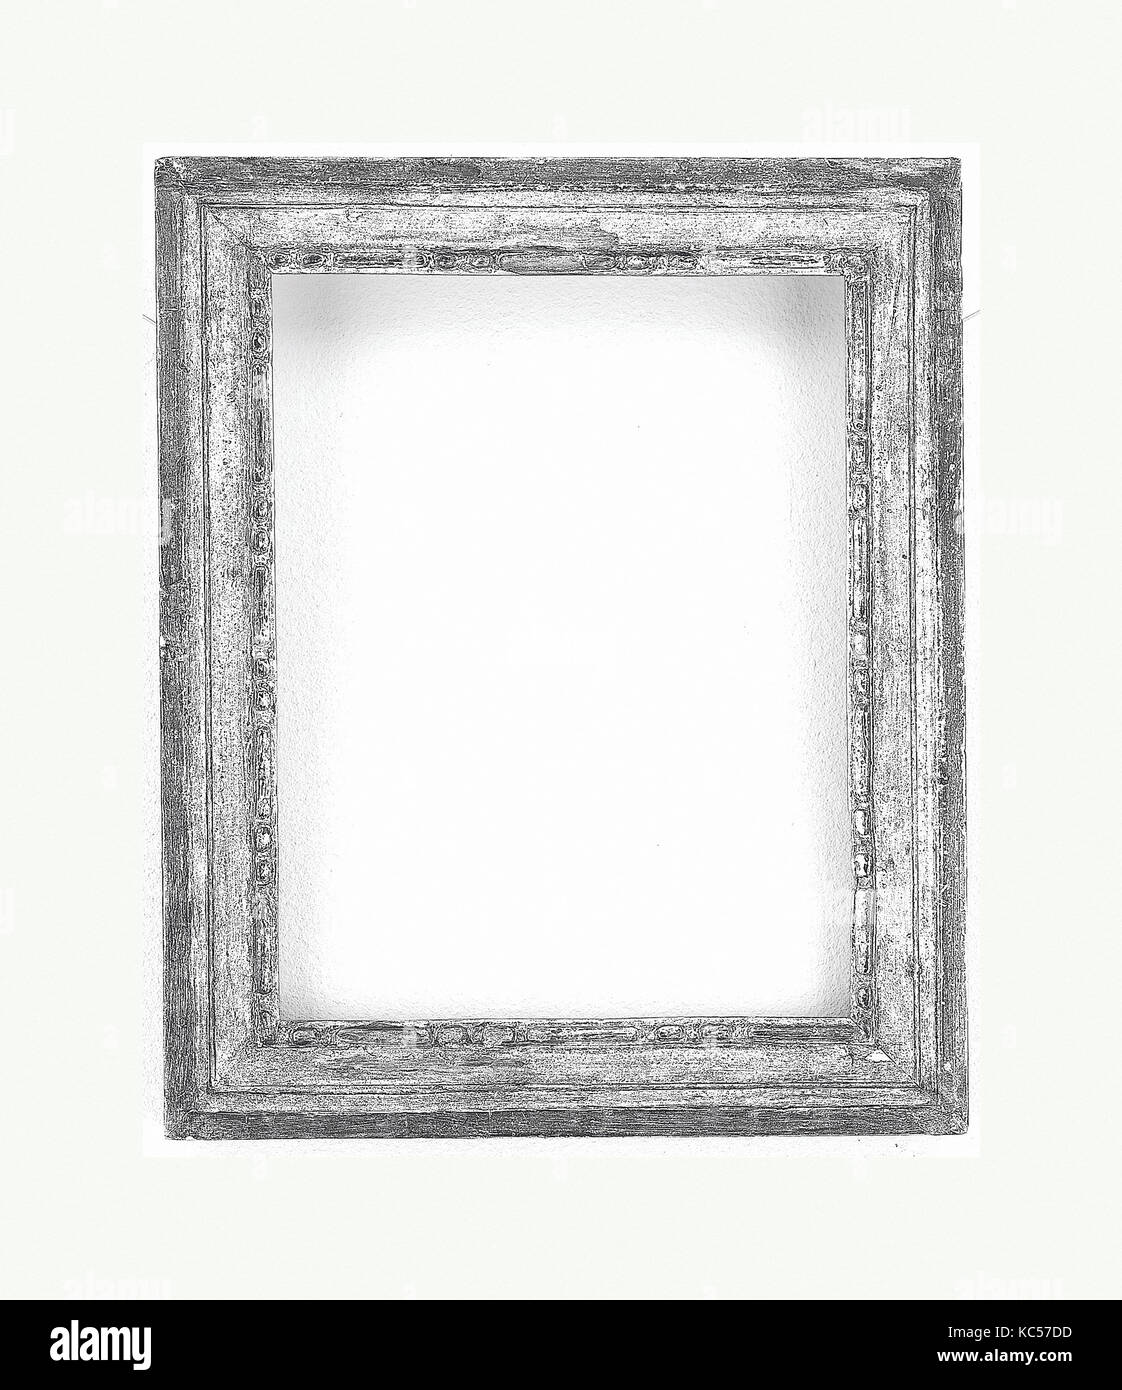 Beste 28 X 20 Rahmen Fotos - Rahmen Ideen - markjohnsonshow.info